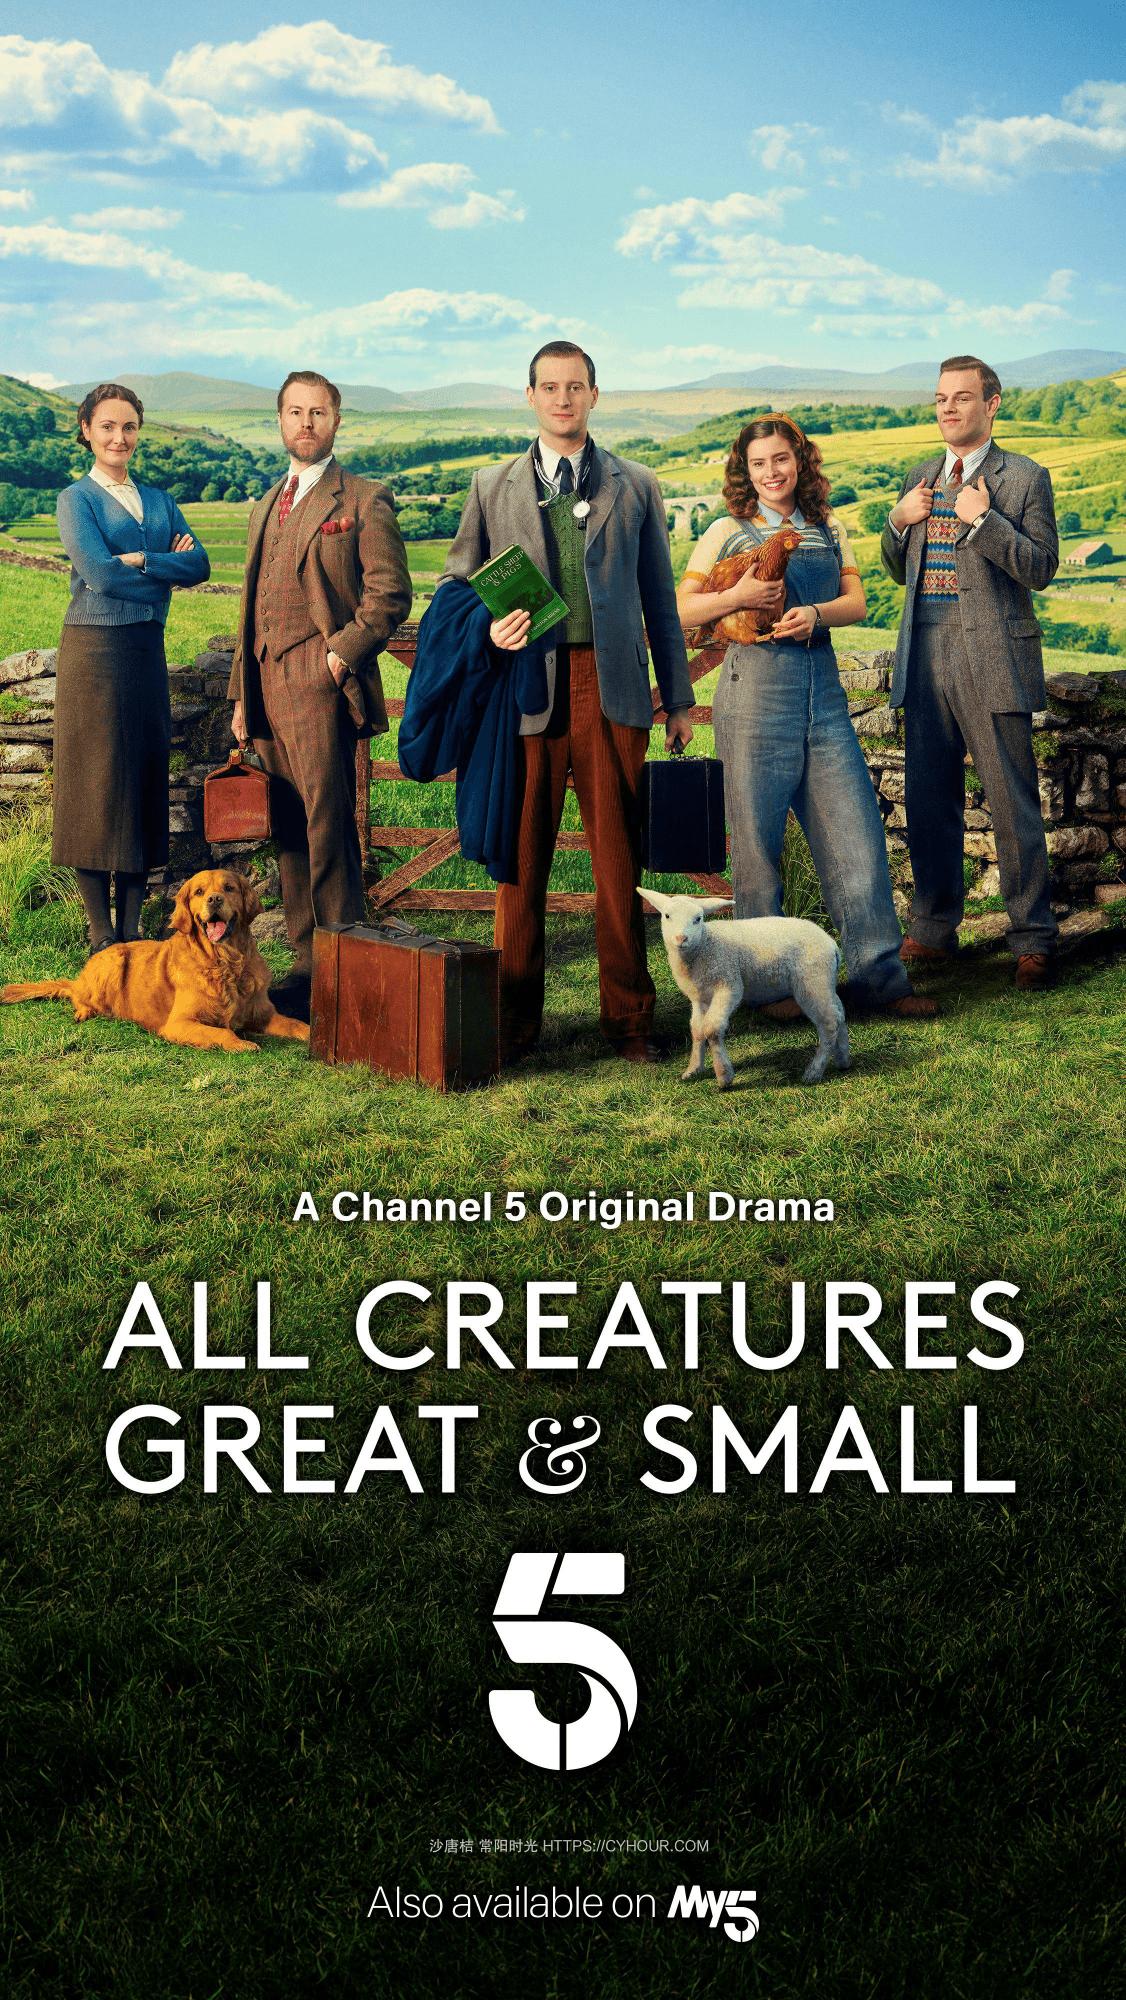 万物生灵 第一季 All Creatures Great and Small Season 1 (2020) 1080p BT 圣诞特别集 英语中字-垃圾站